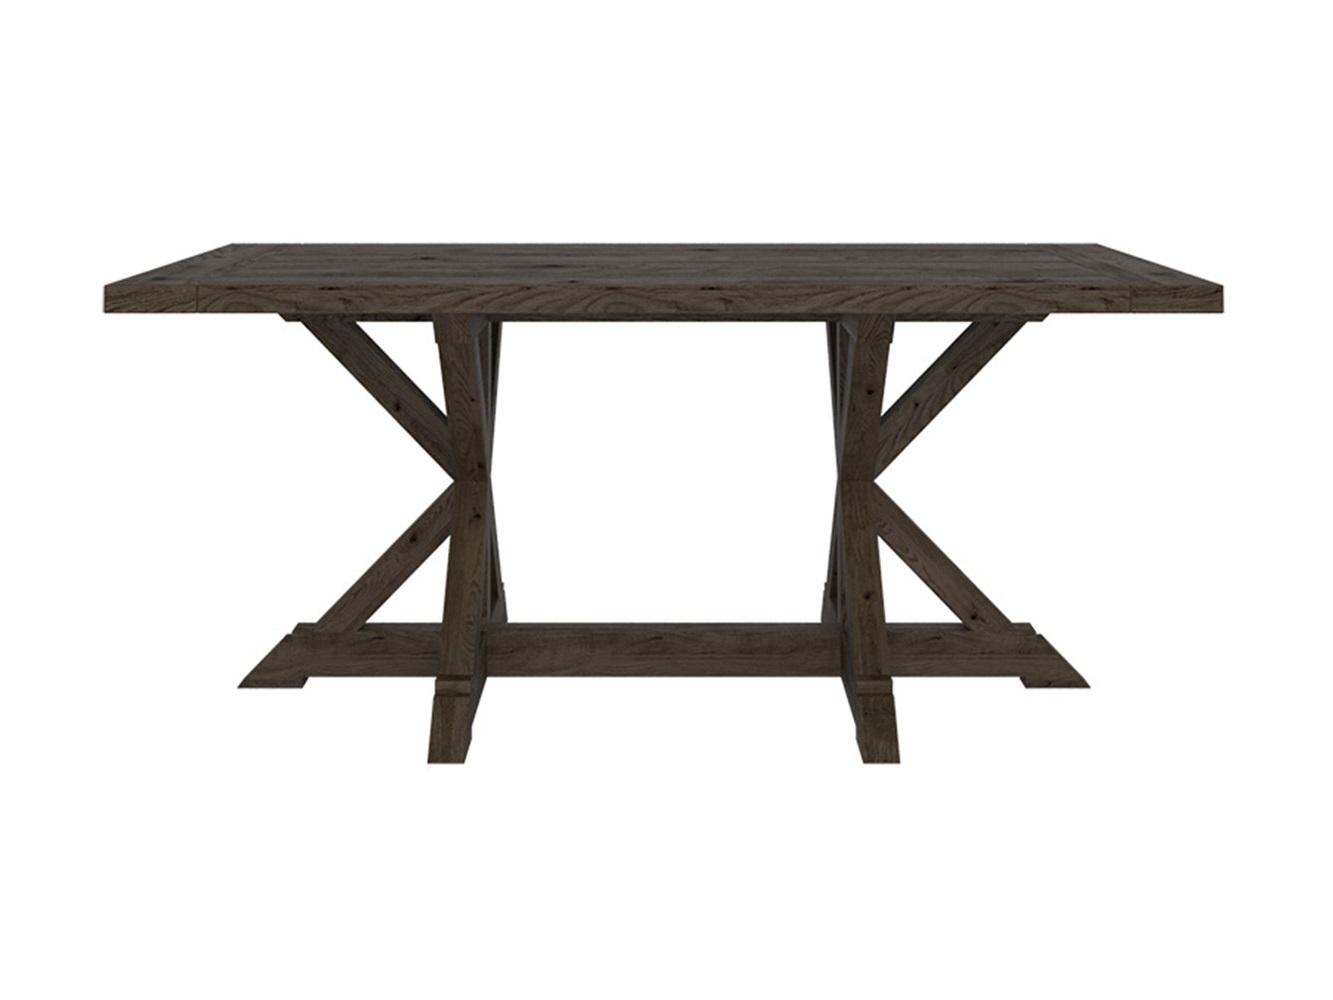 Обеденный стол TavernОбеденные столы<br>Обеденный стол из коллекции Tavern.&amp;nbsp;Выполнен полностью из массива дуба.&amp;nbsp;<br><br>kit: None<br>gender: None